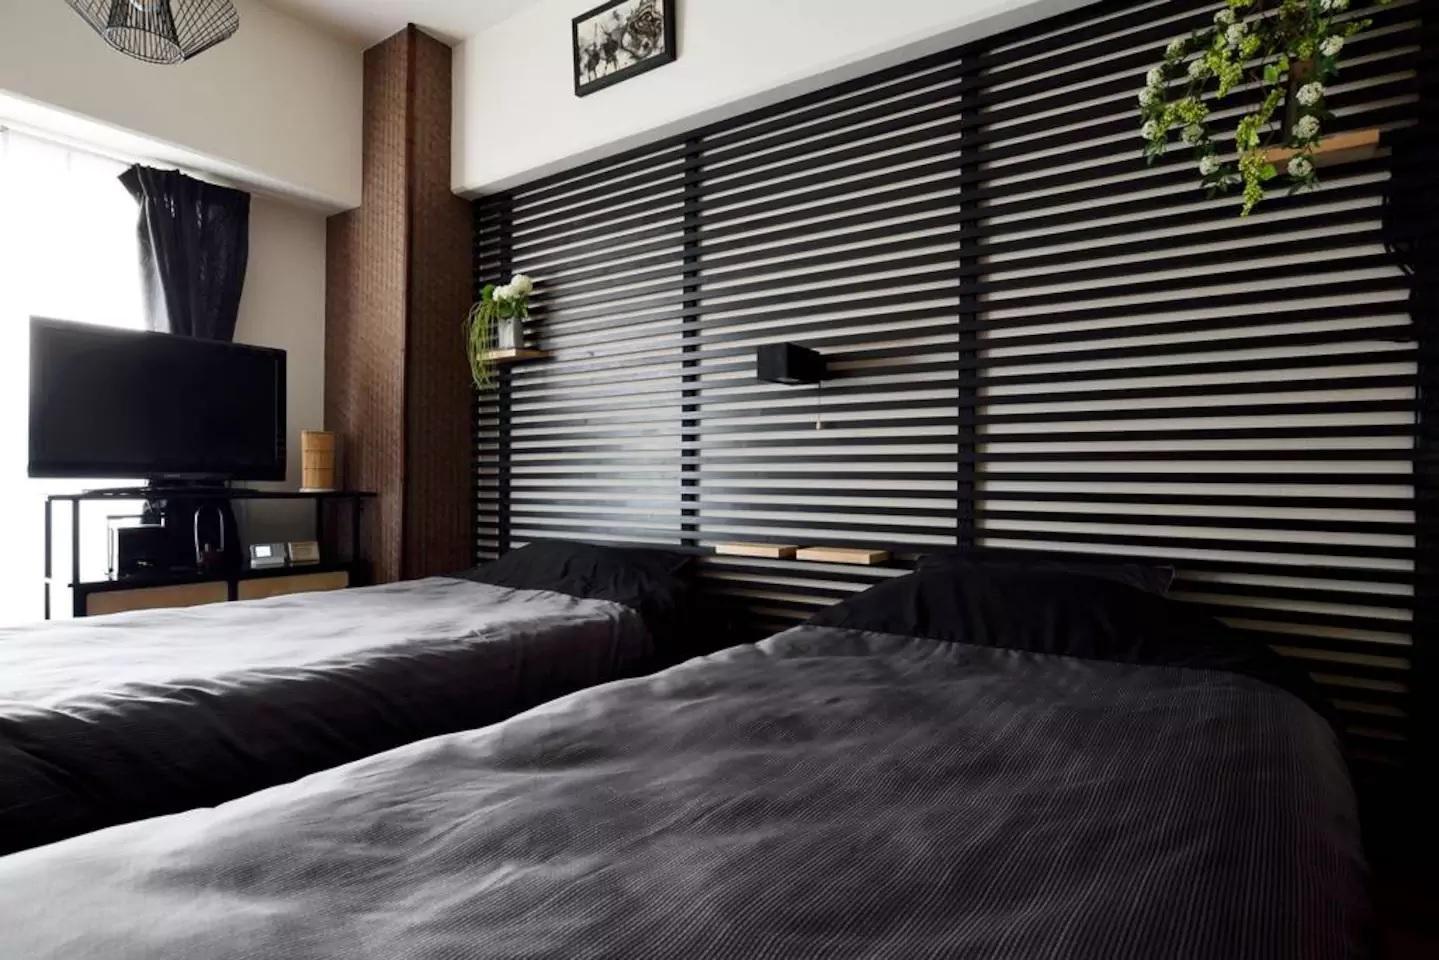 1 Bedroom Japnanese Room In Shin Osaka1